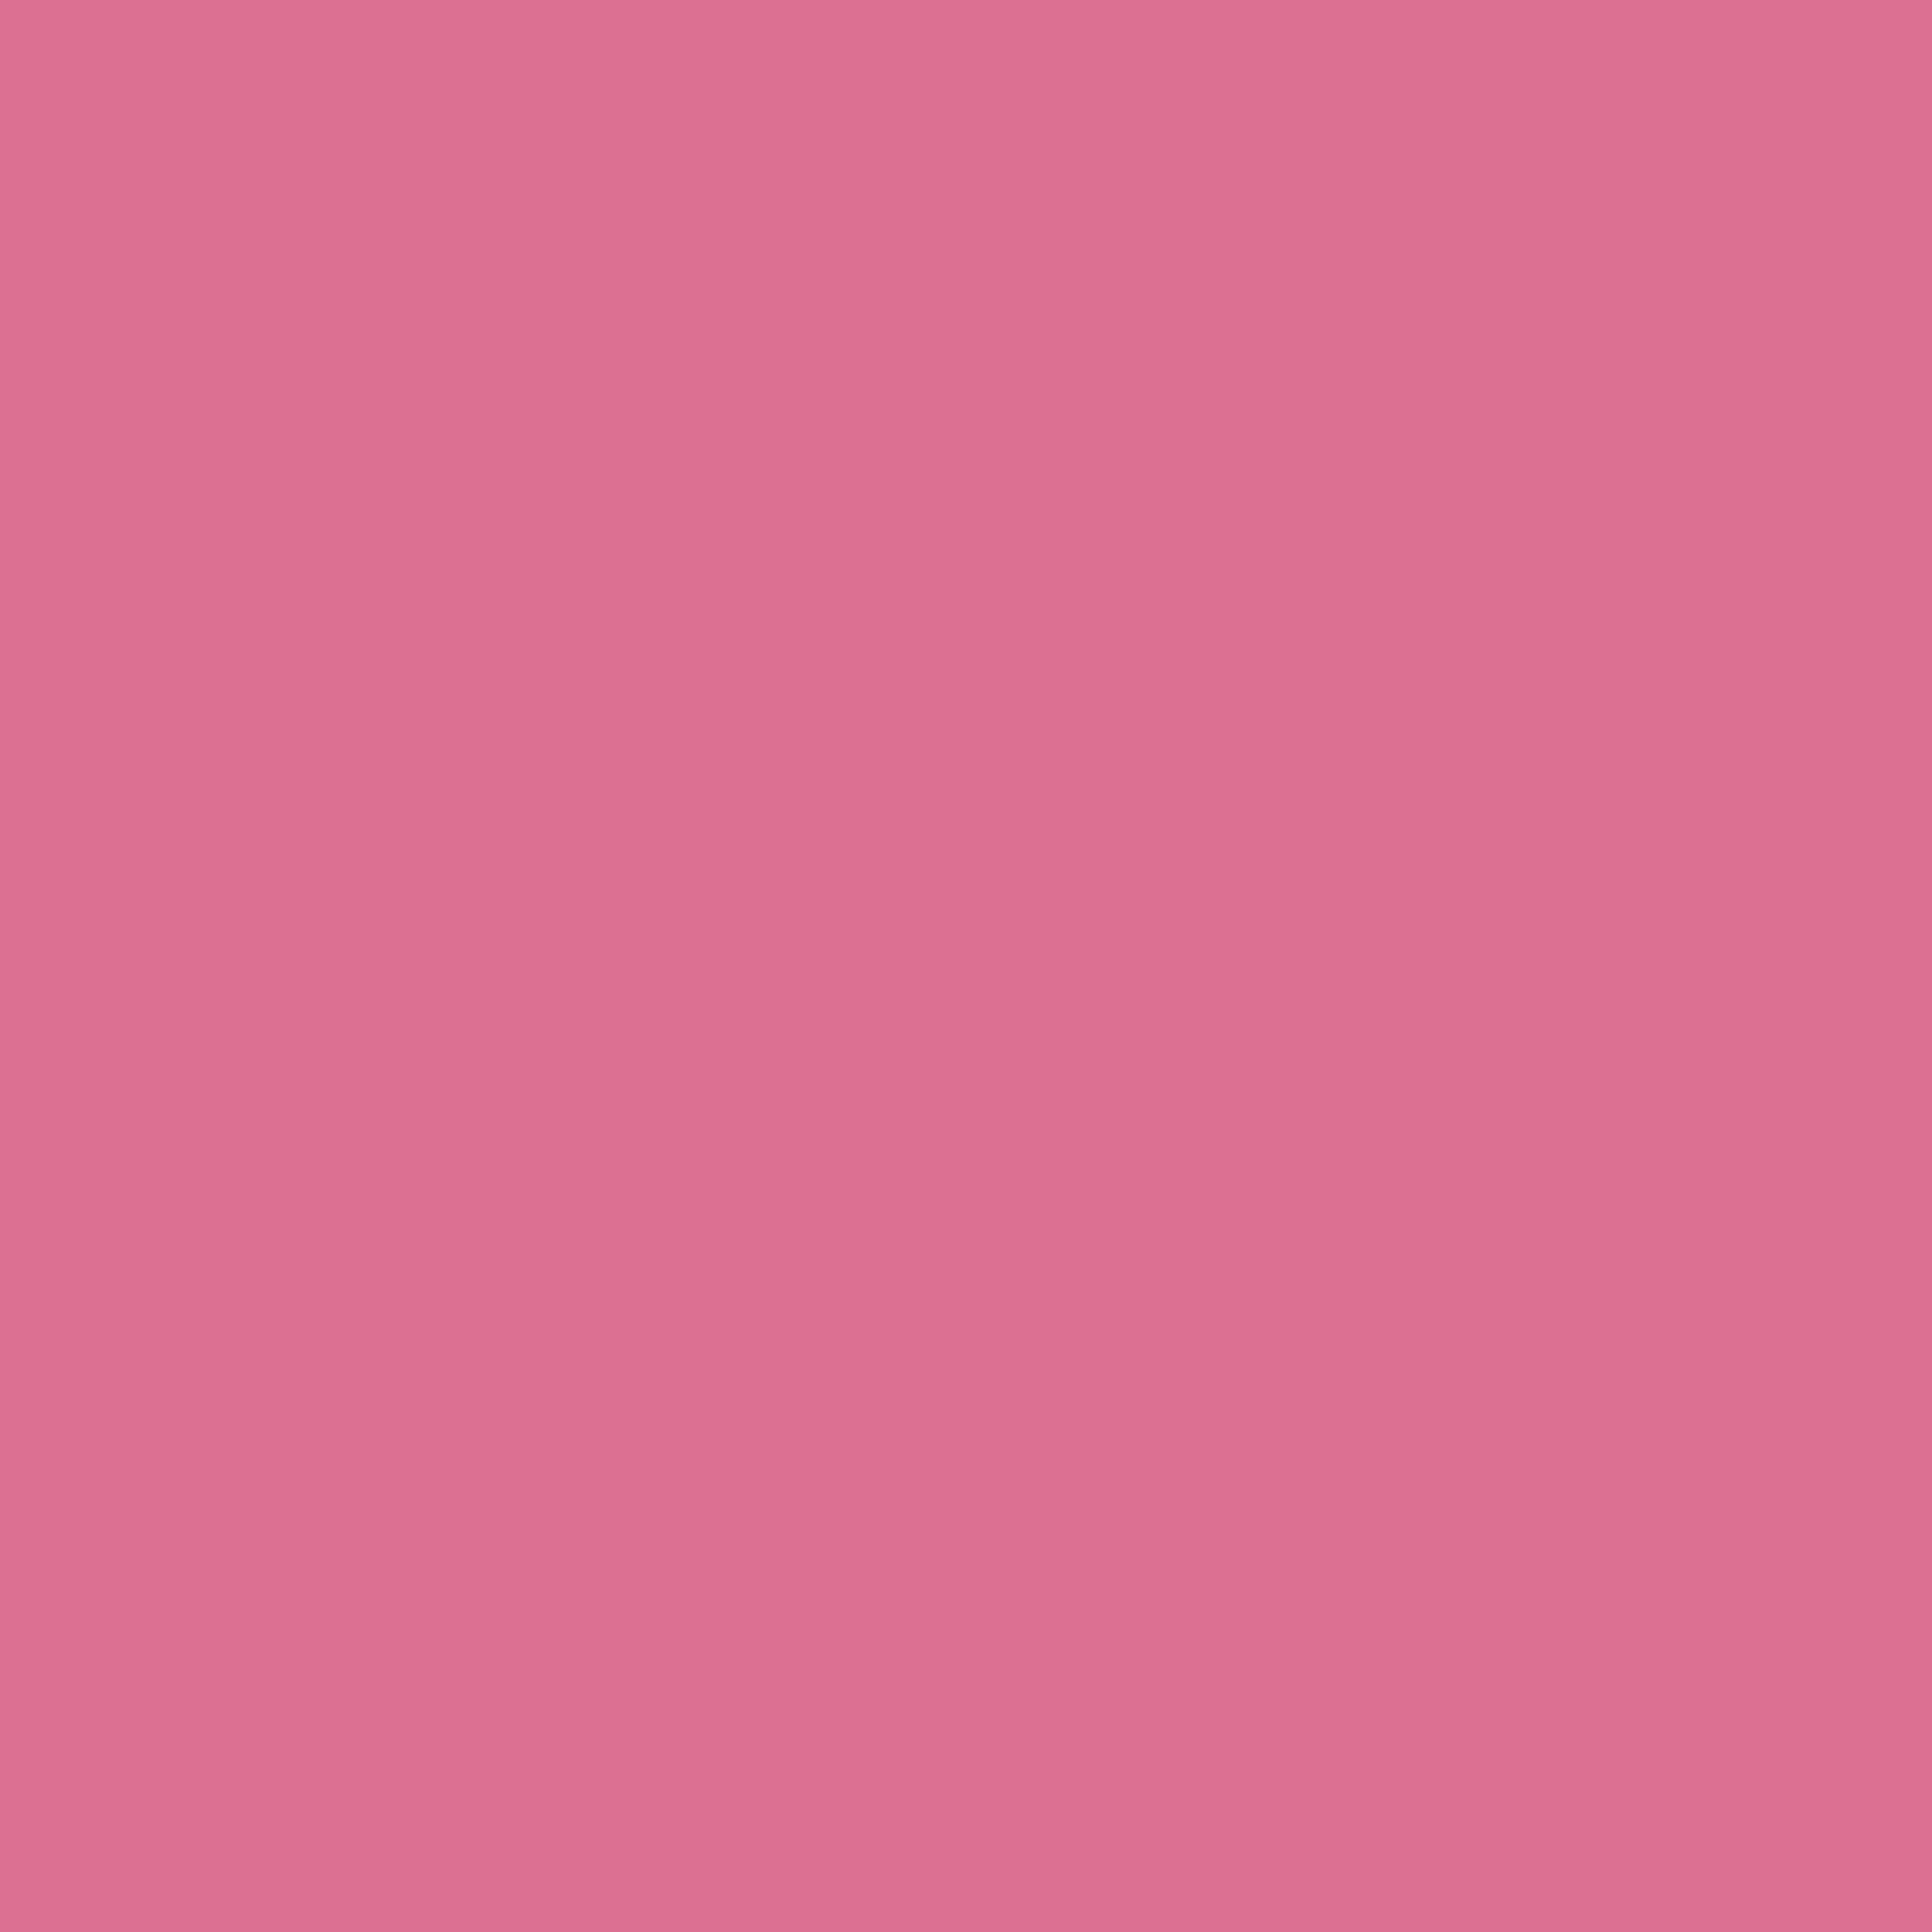 3600x3600 Pale Violet-red Solid Color Background